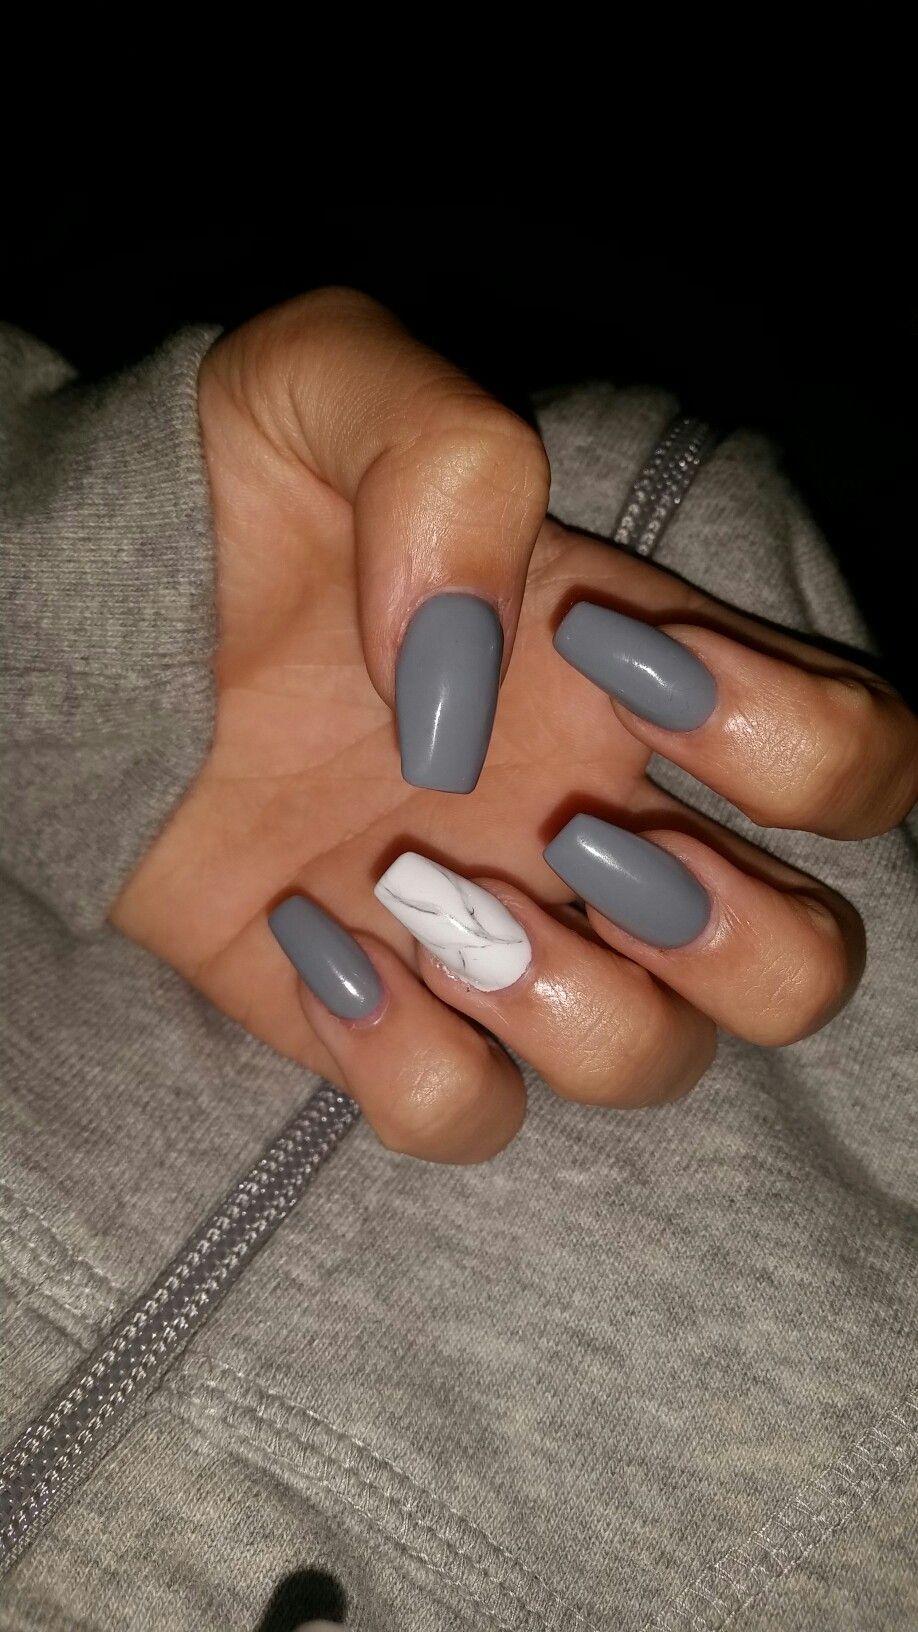 Manichiura Casual Nails Short Acrylic Nails Designs Best Acrylic Nails